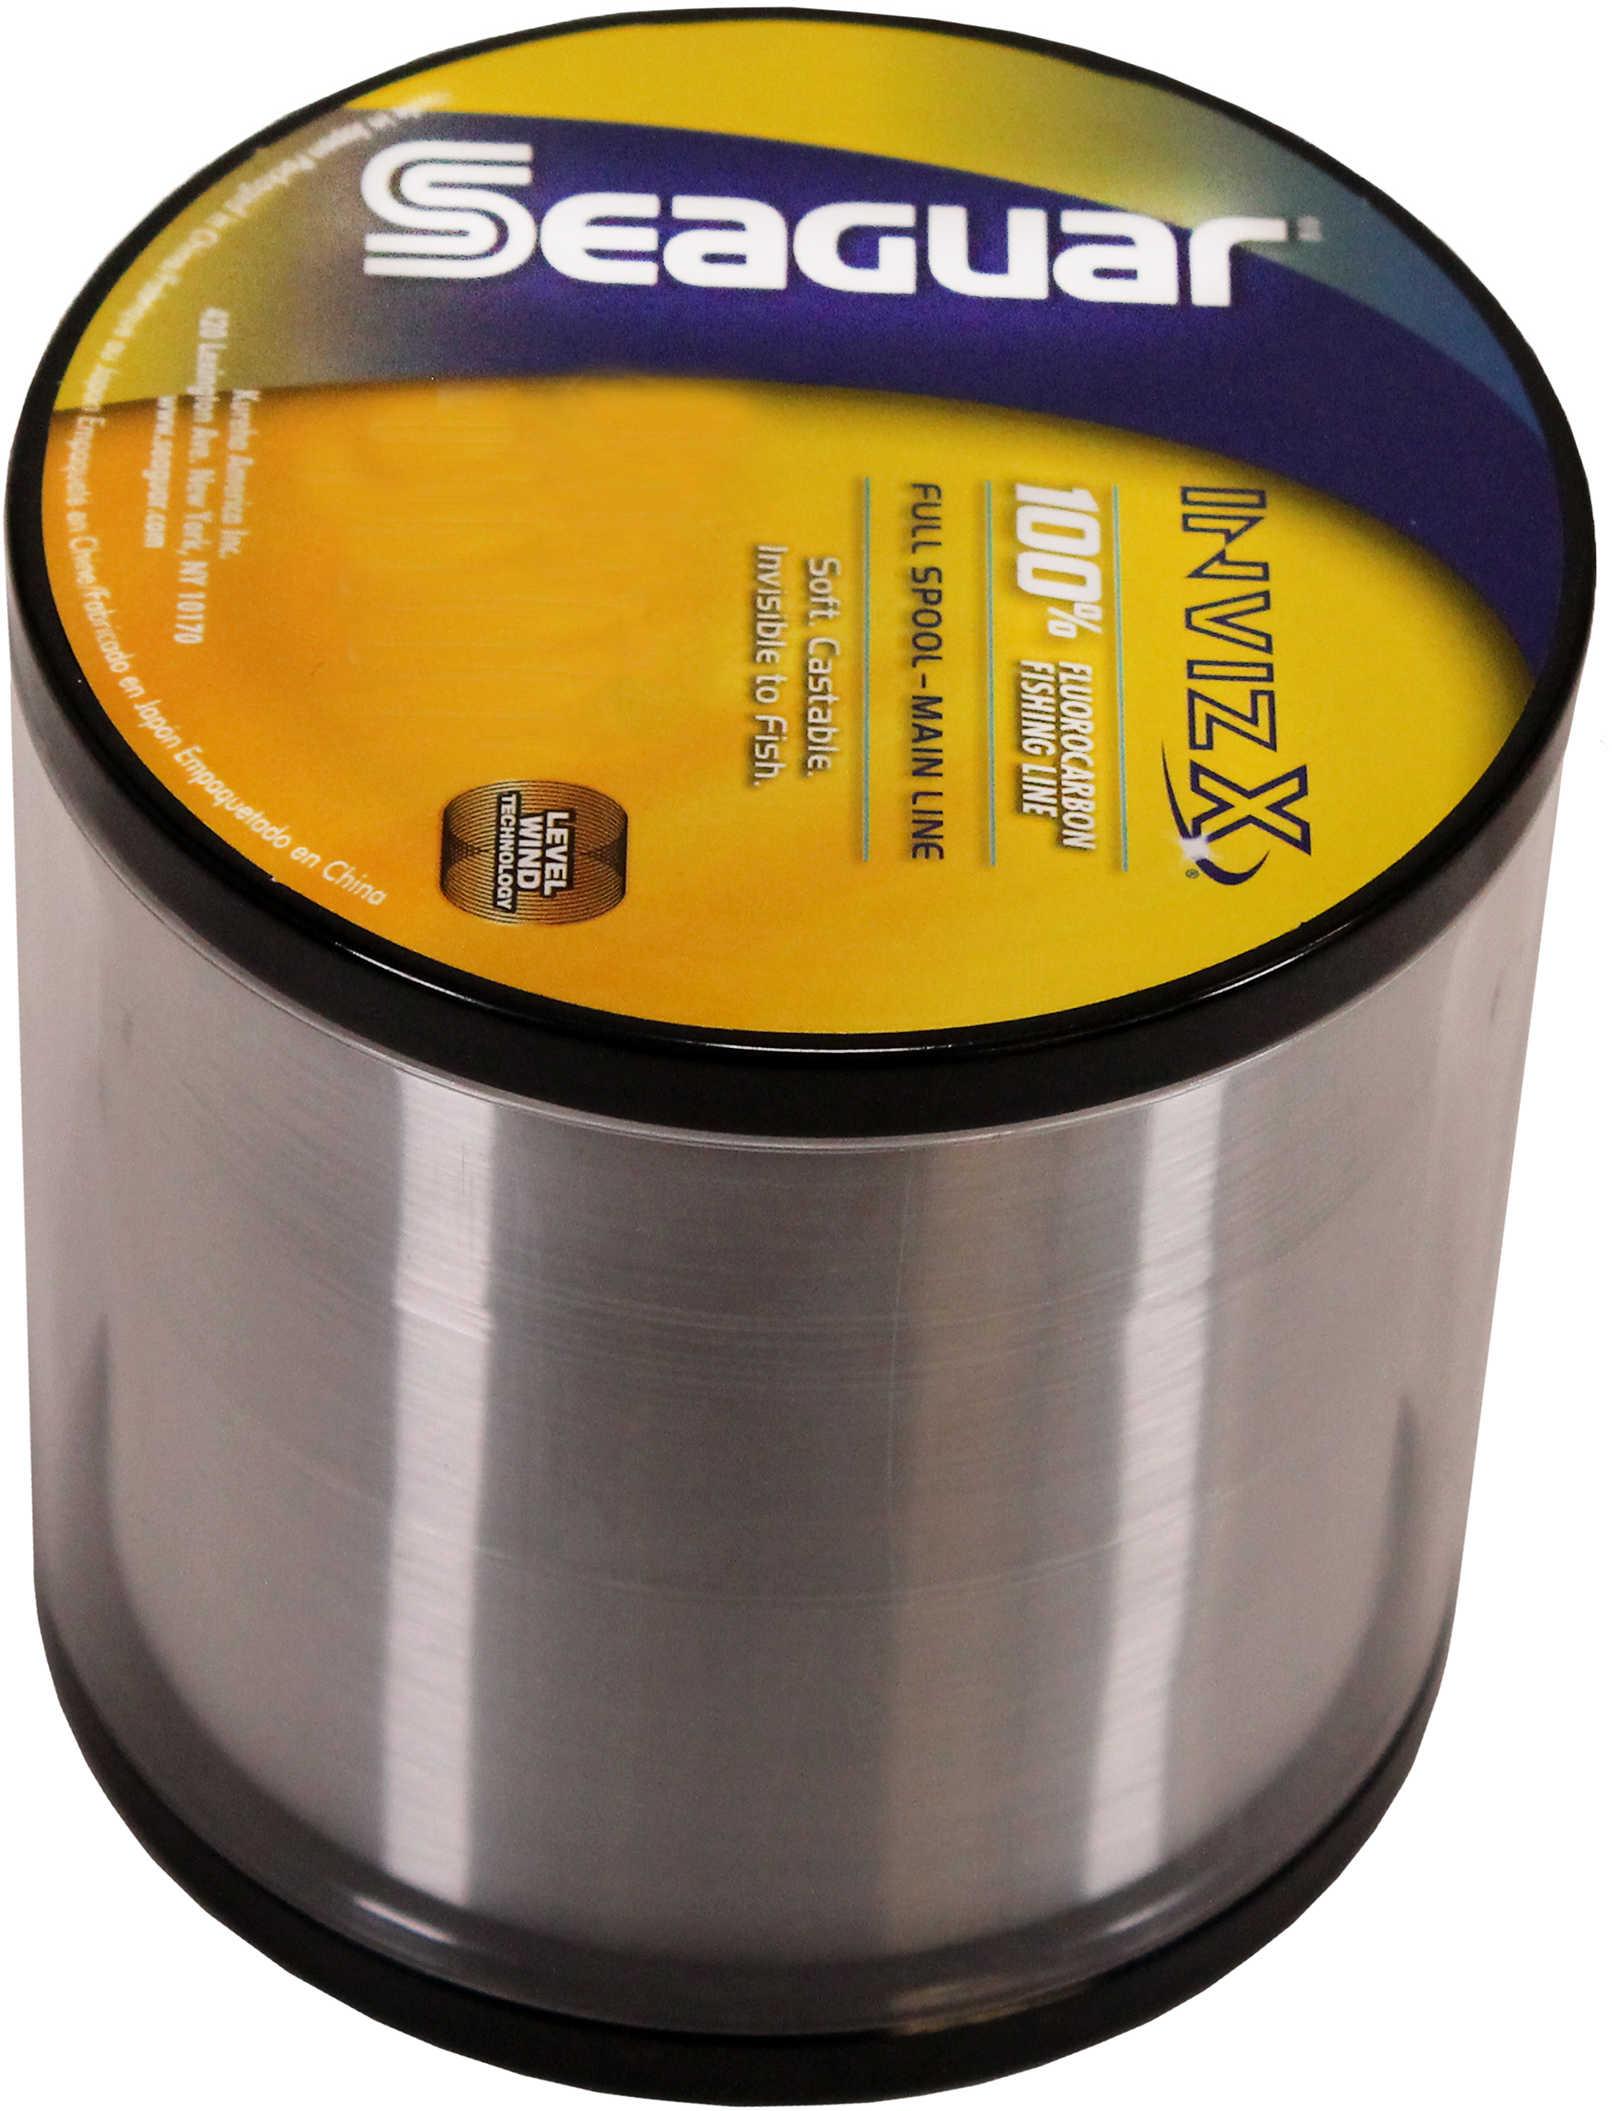 Seaguar / Kureha America Seaguar Inviz X Fluorcarbon Clear 1000yds 12lb Md#: 12VZ-1000